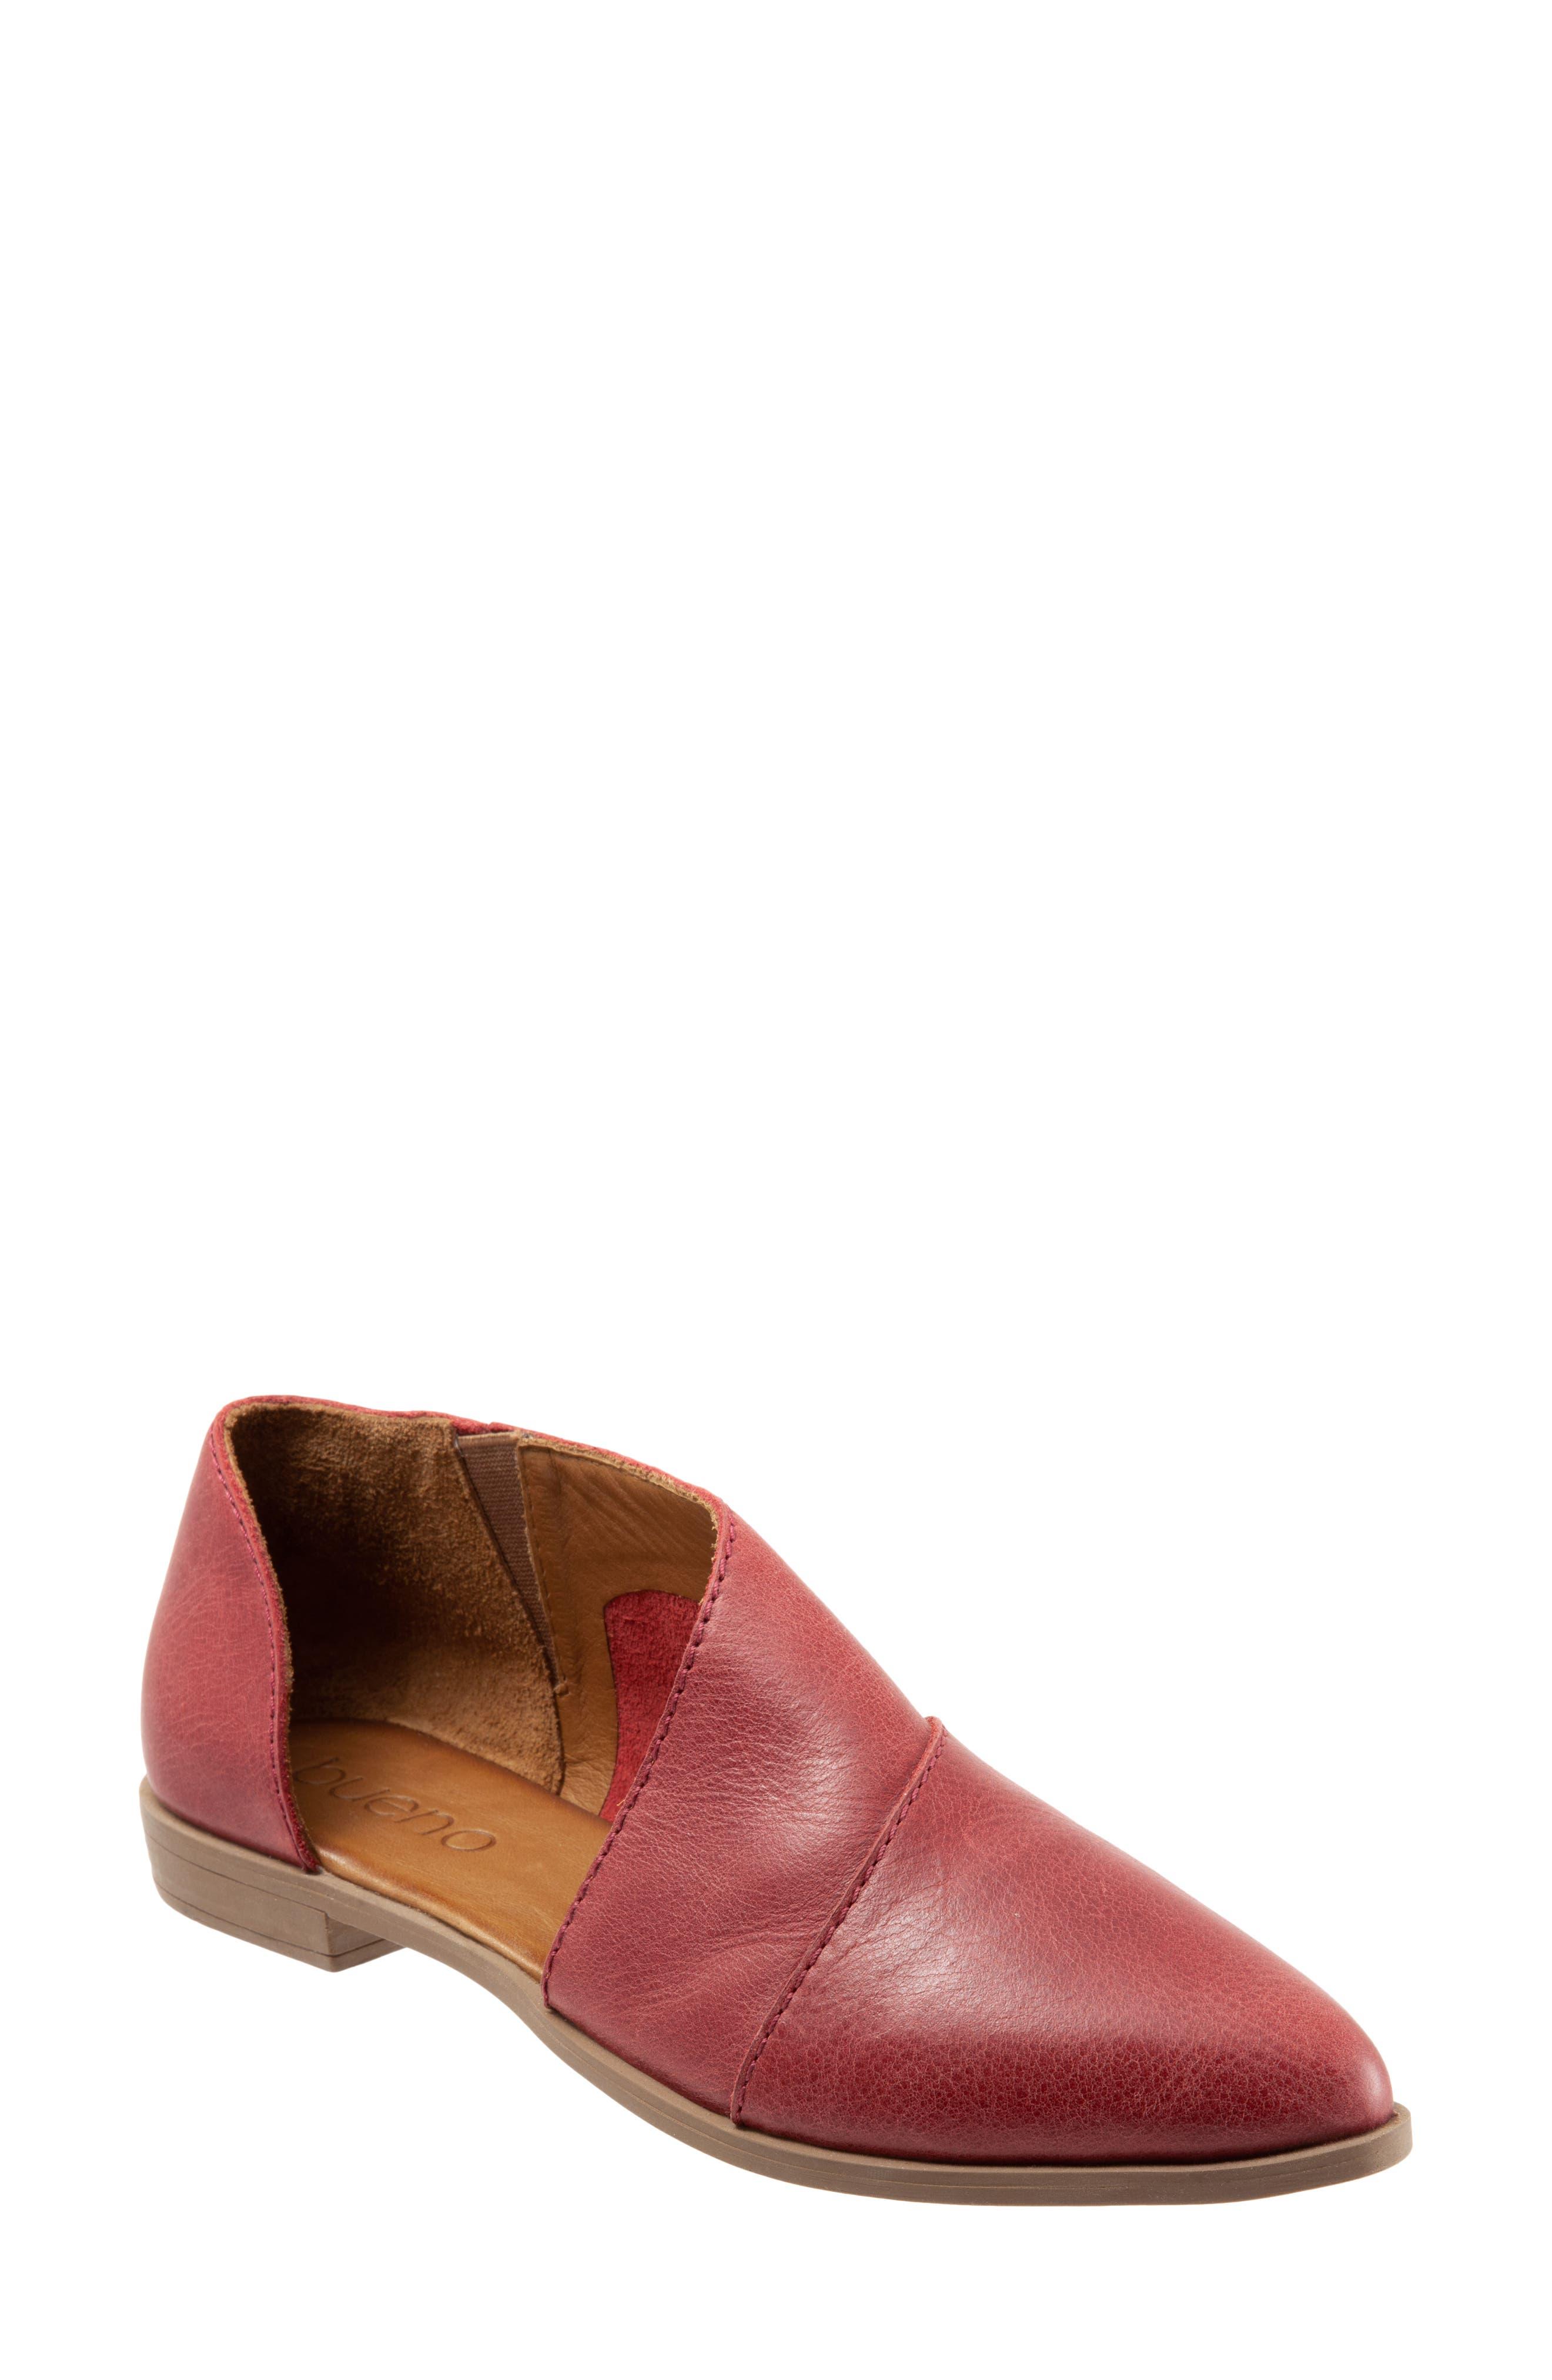 Blake Half D'Orsay Leather Flat